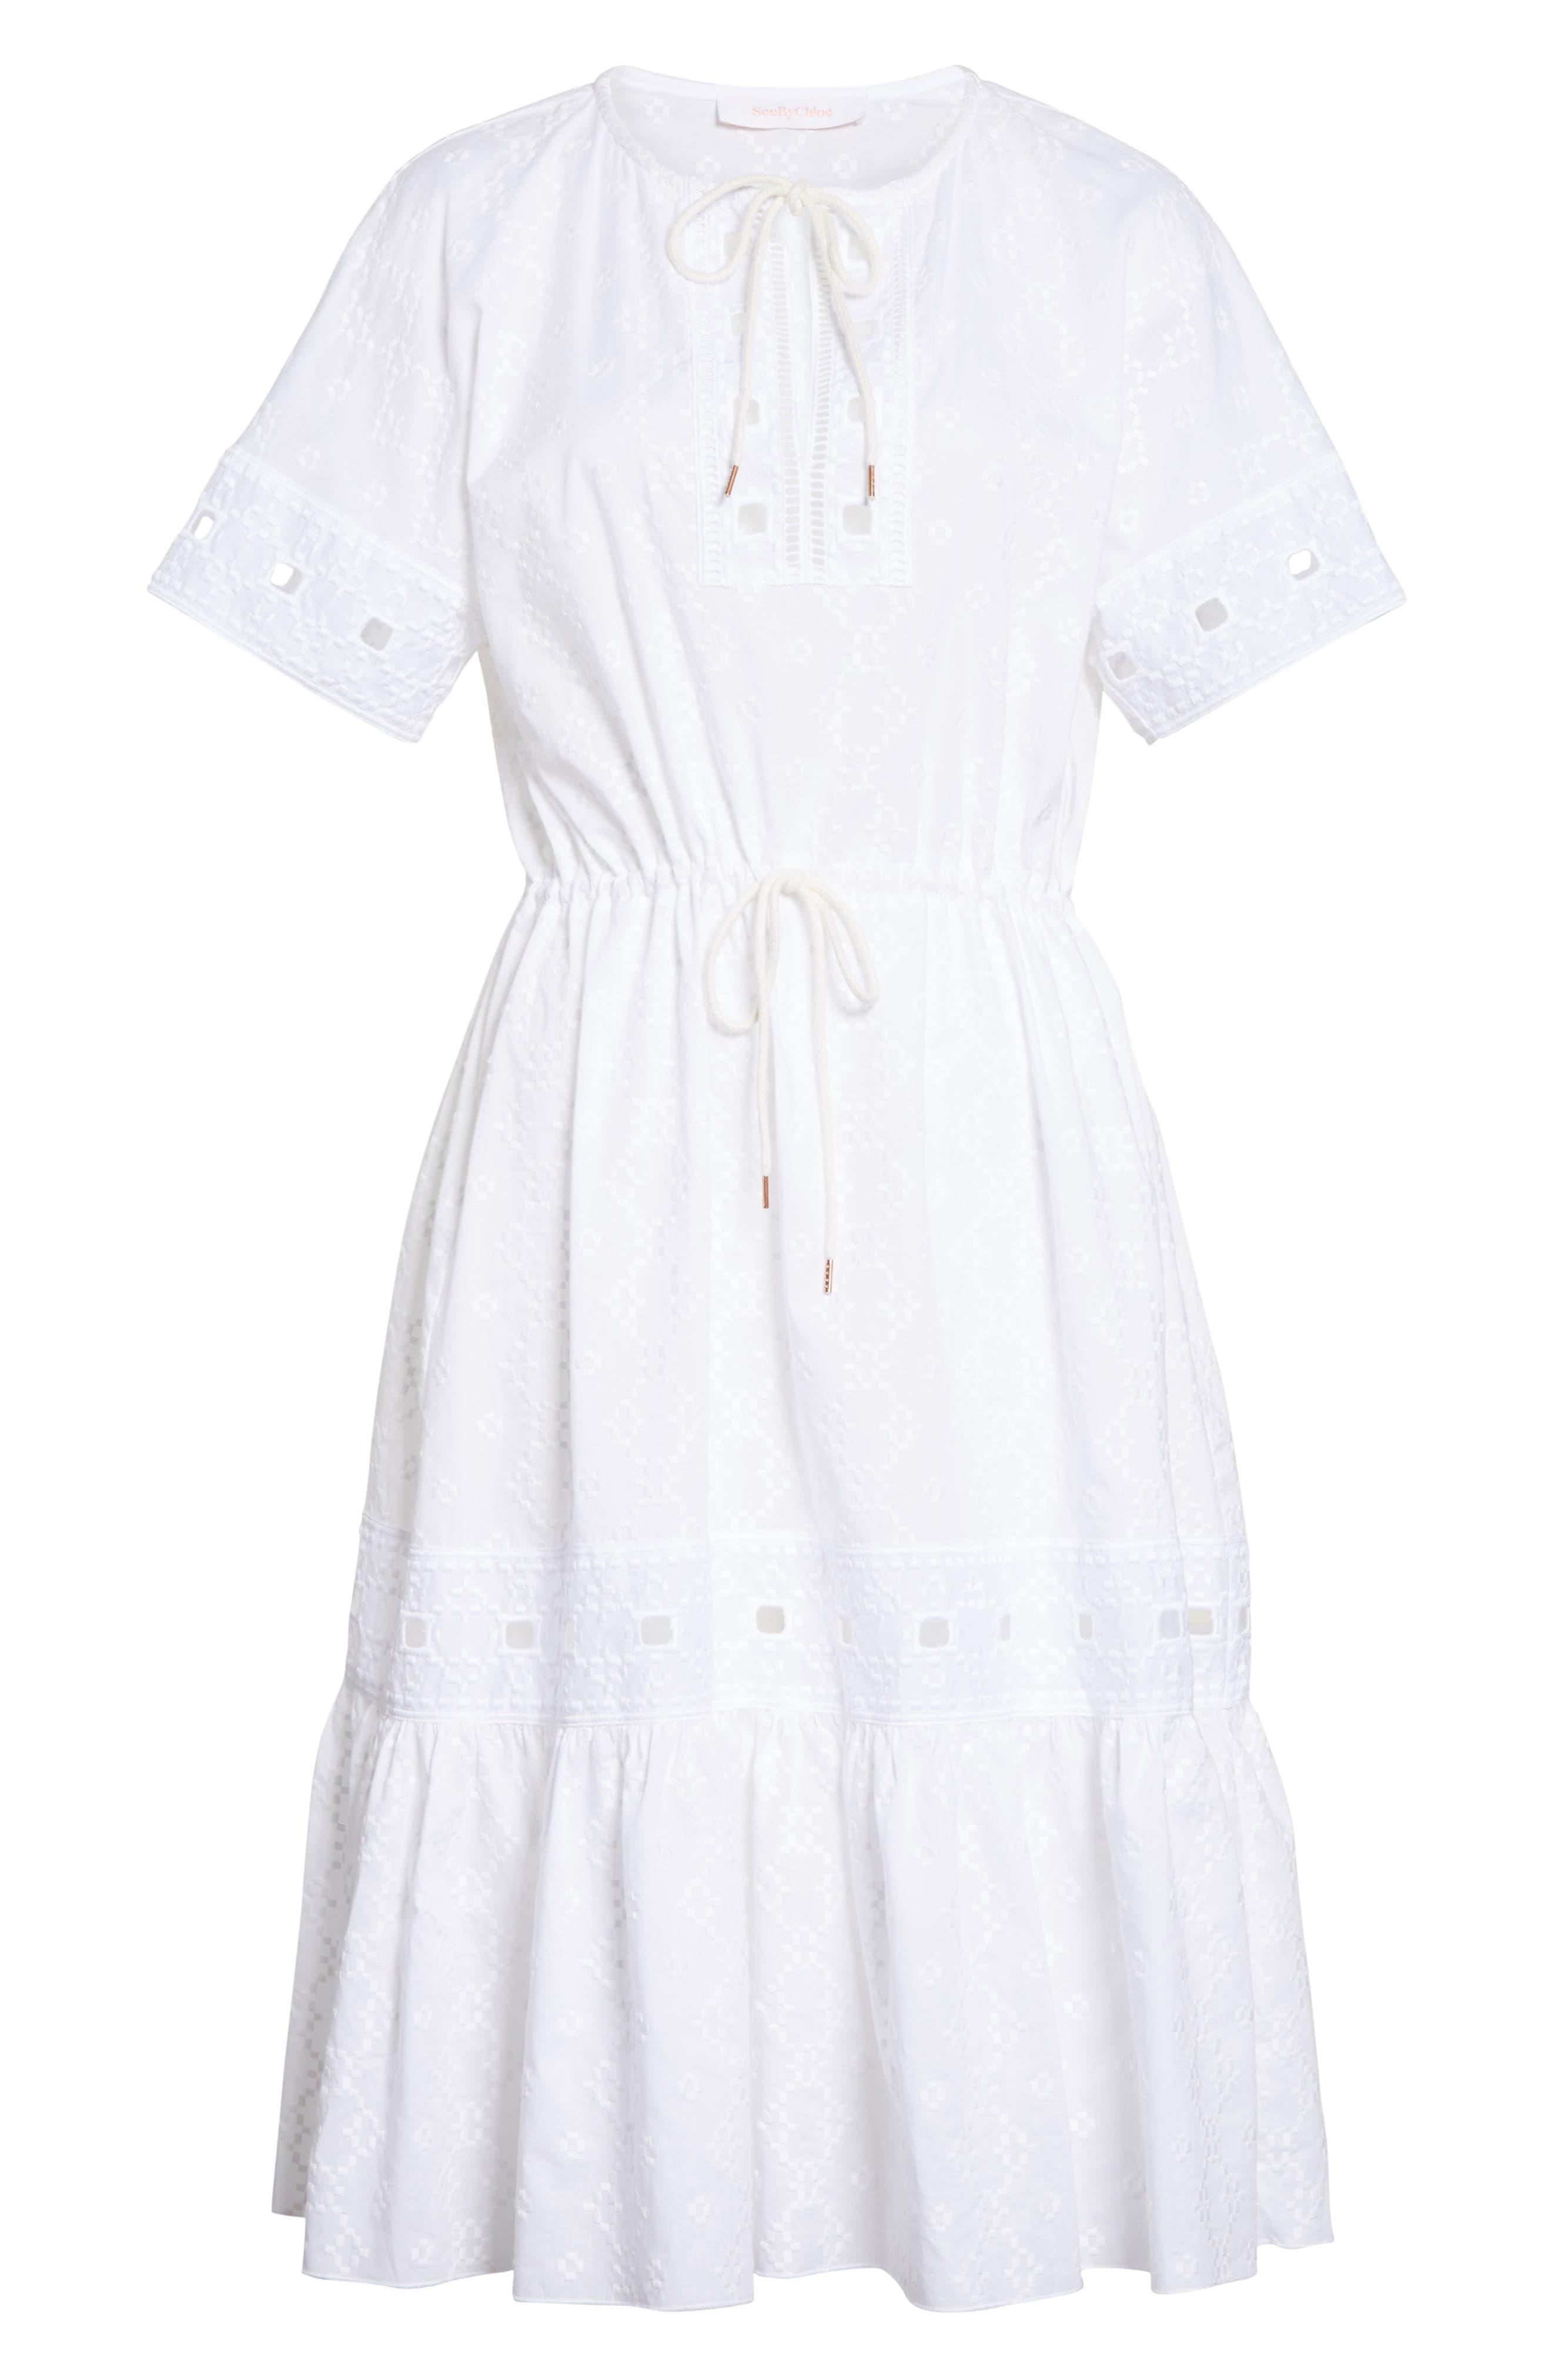 Cotton Eyelet Dress,                             Alternate thumbnail 6, color,                             101